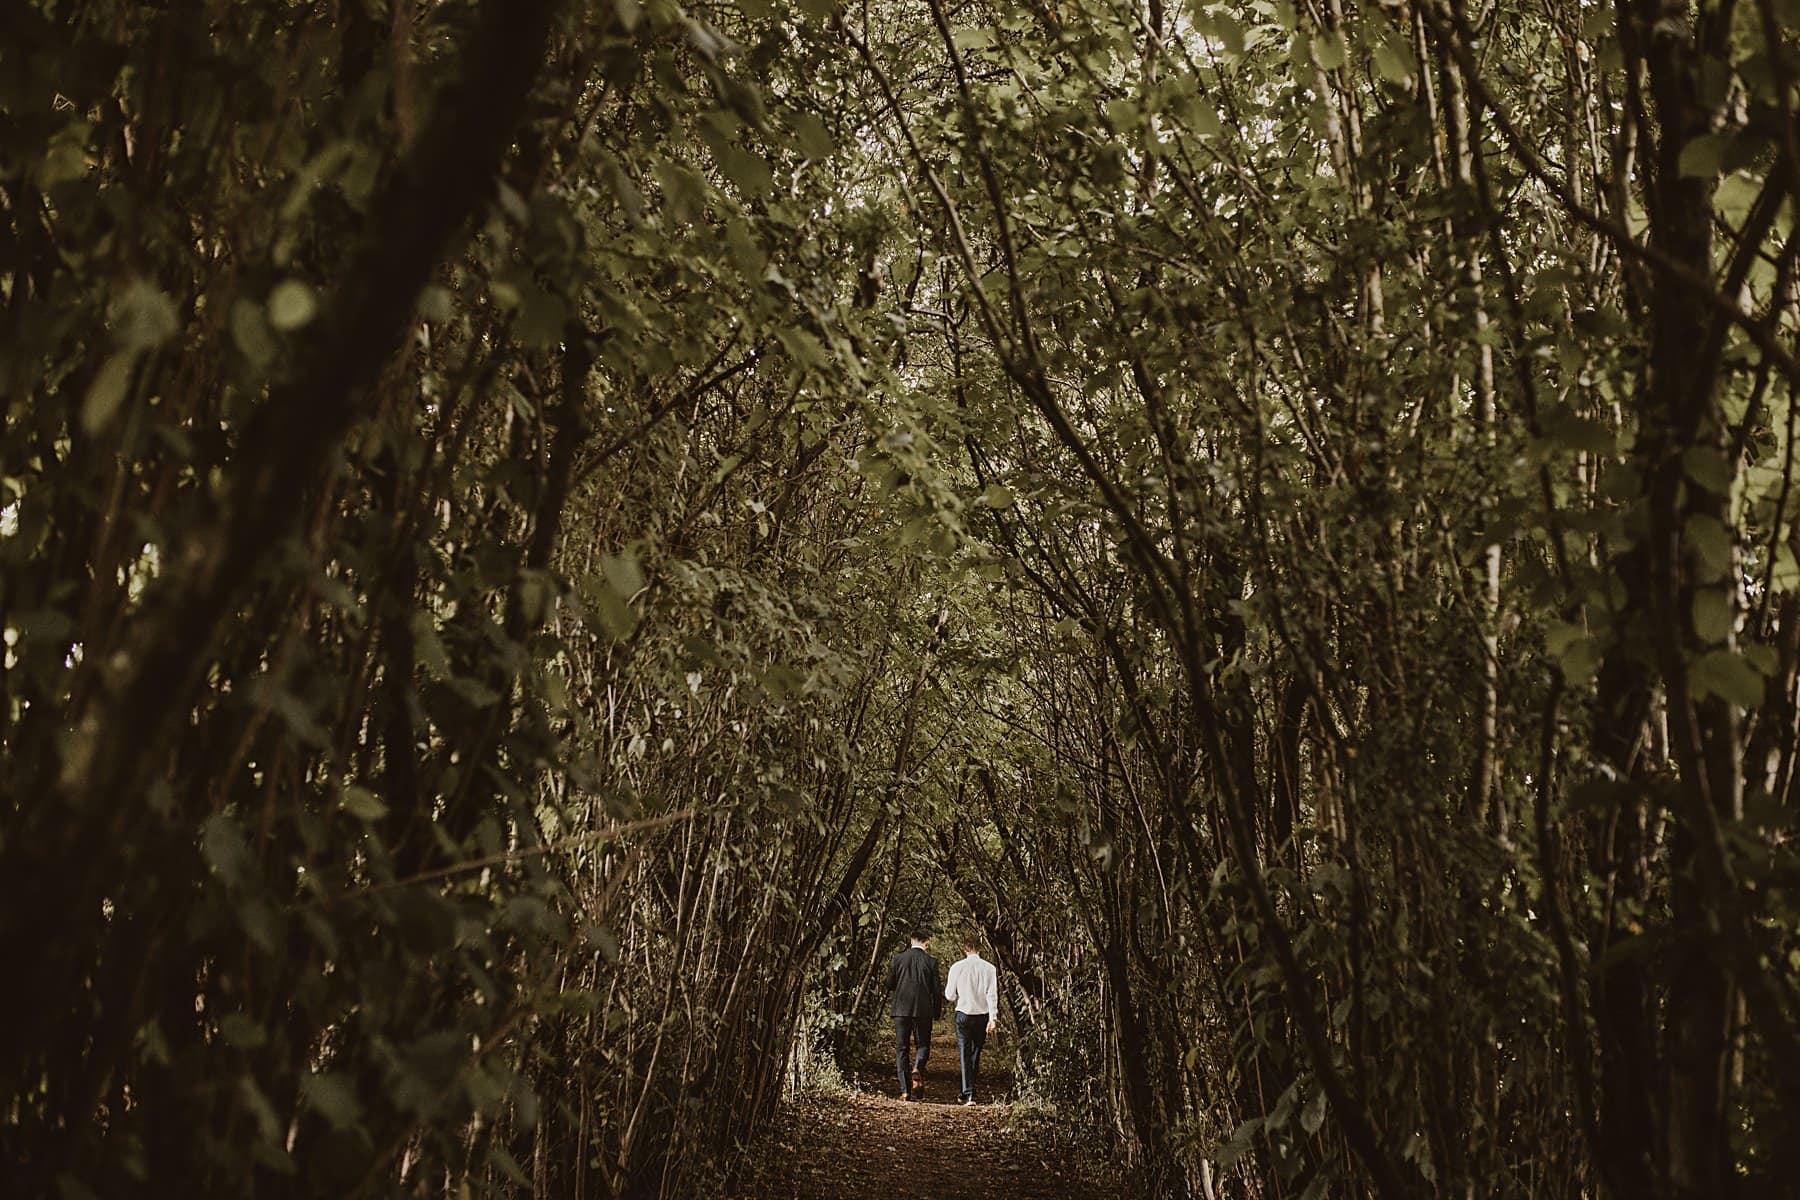 Nature corridor, men walking through